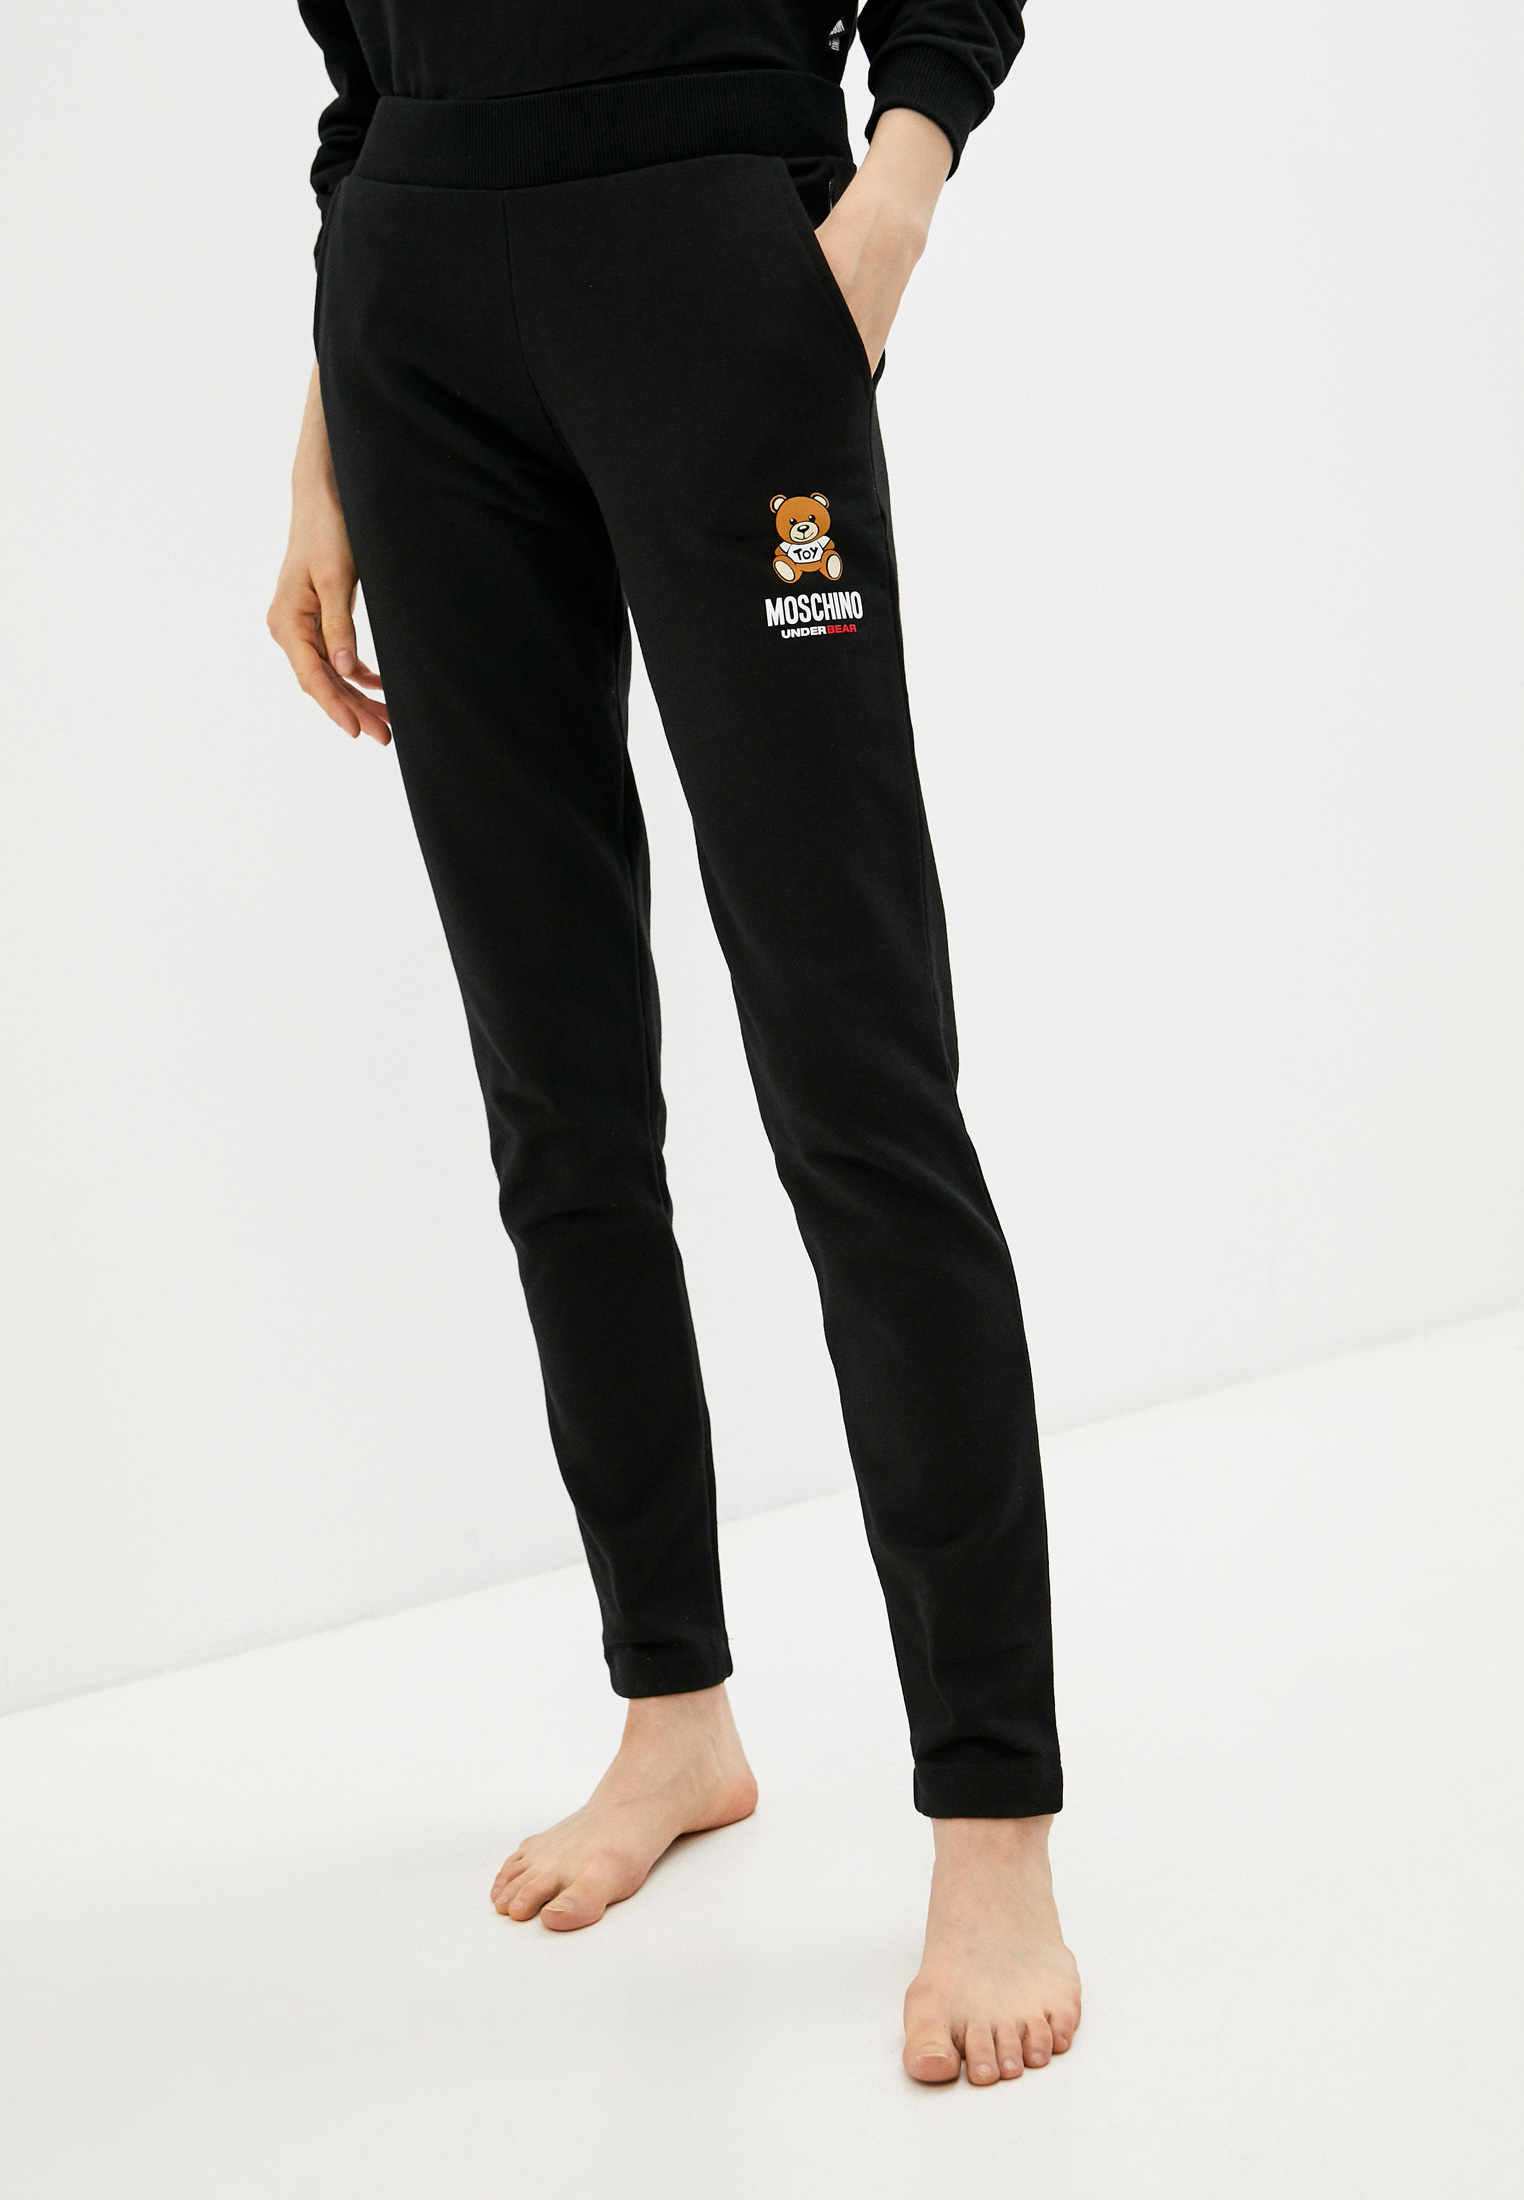 Женские спортивные брюки Moschino Underwear 4329 9020